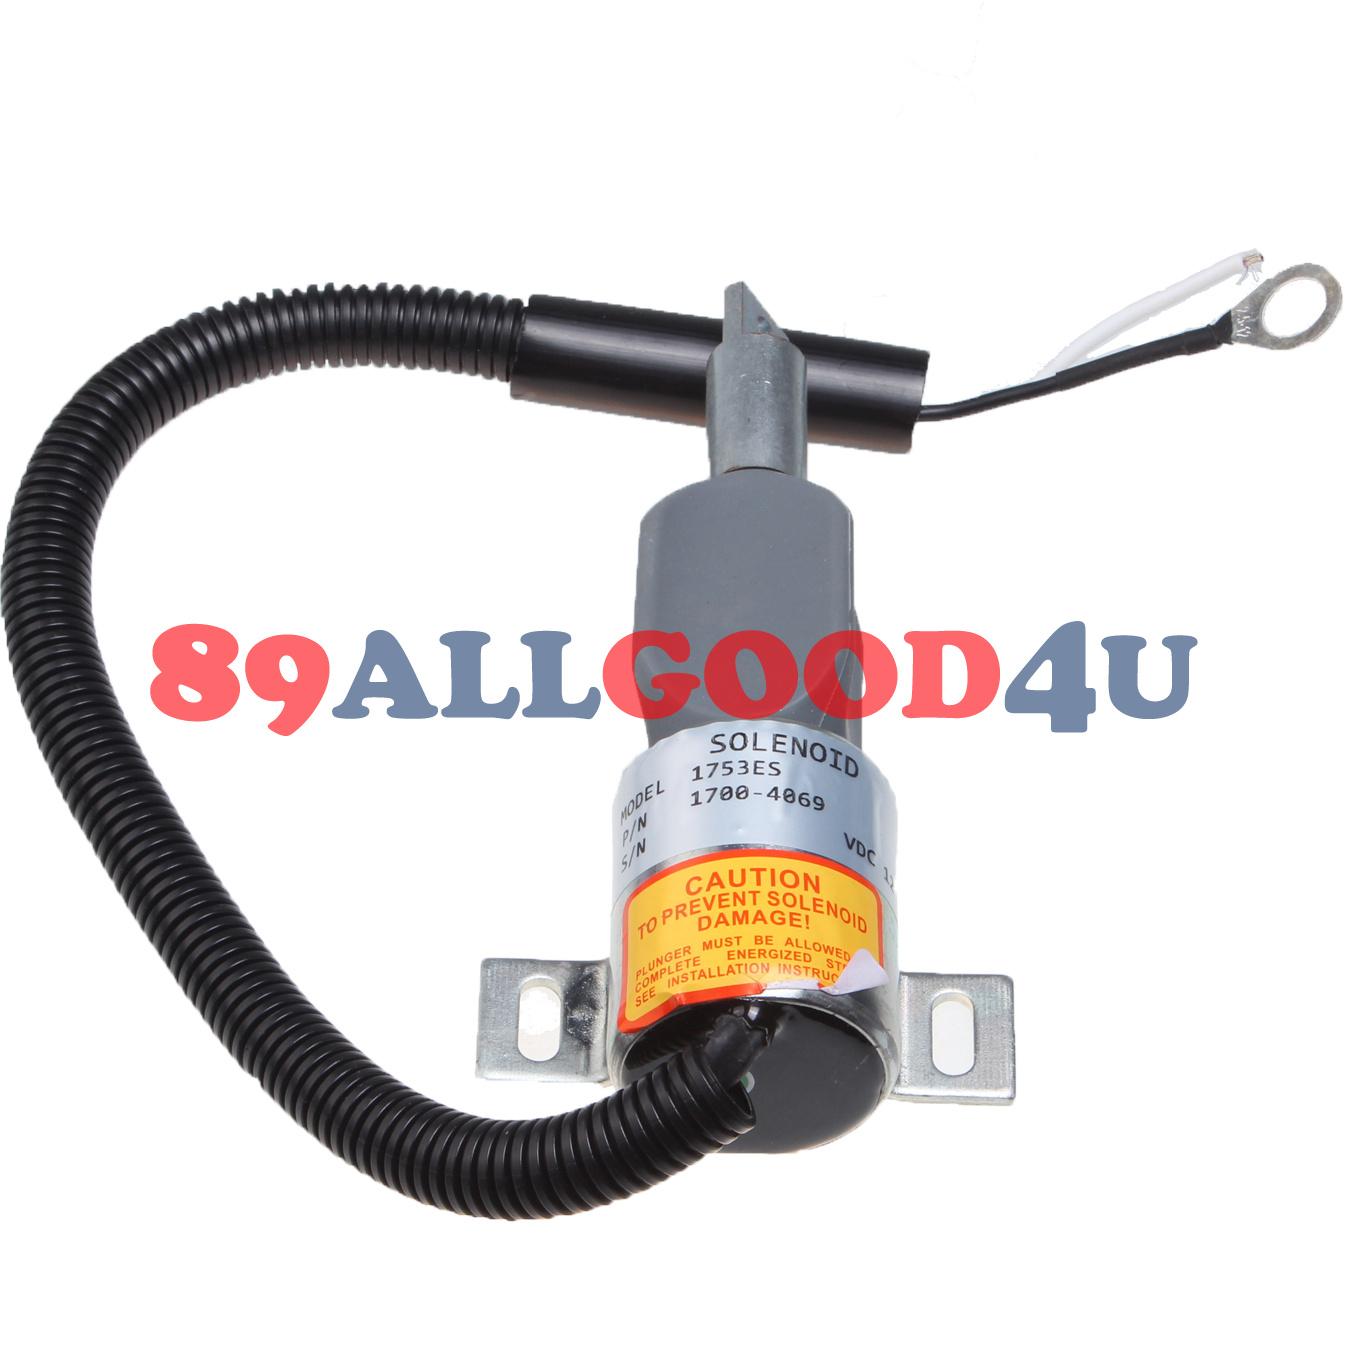 Details about New Fuel Shut Off Solenoid for TAKEUCHI TL140 Loaders 12V